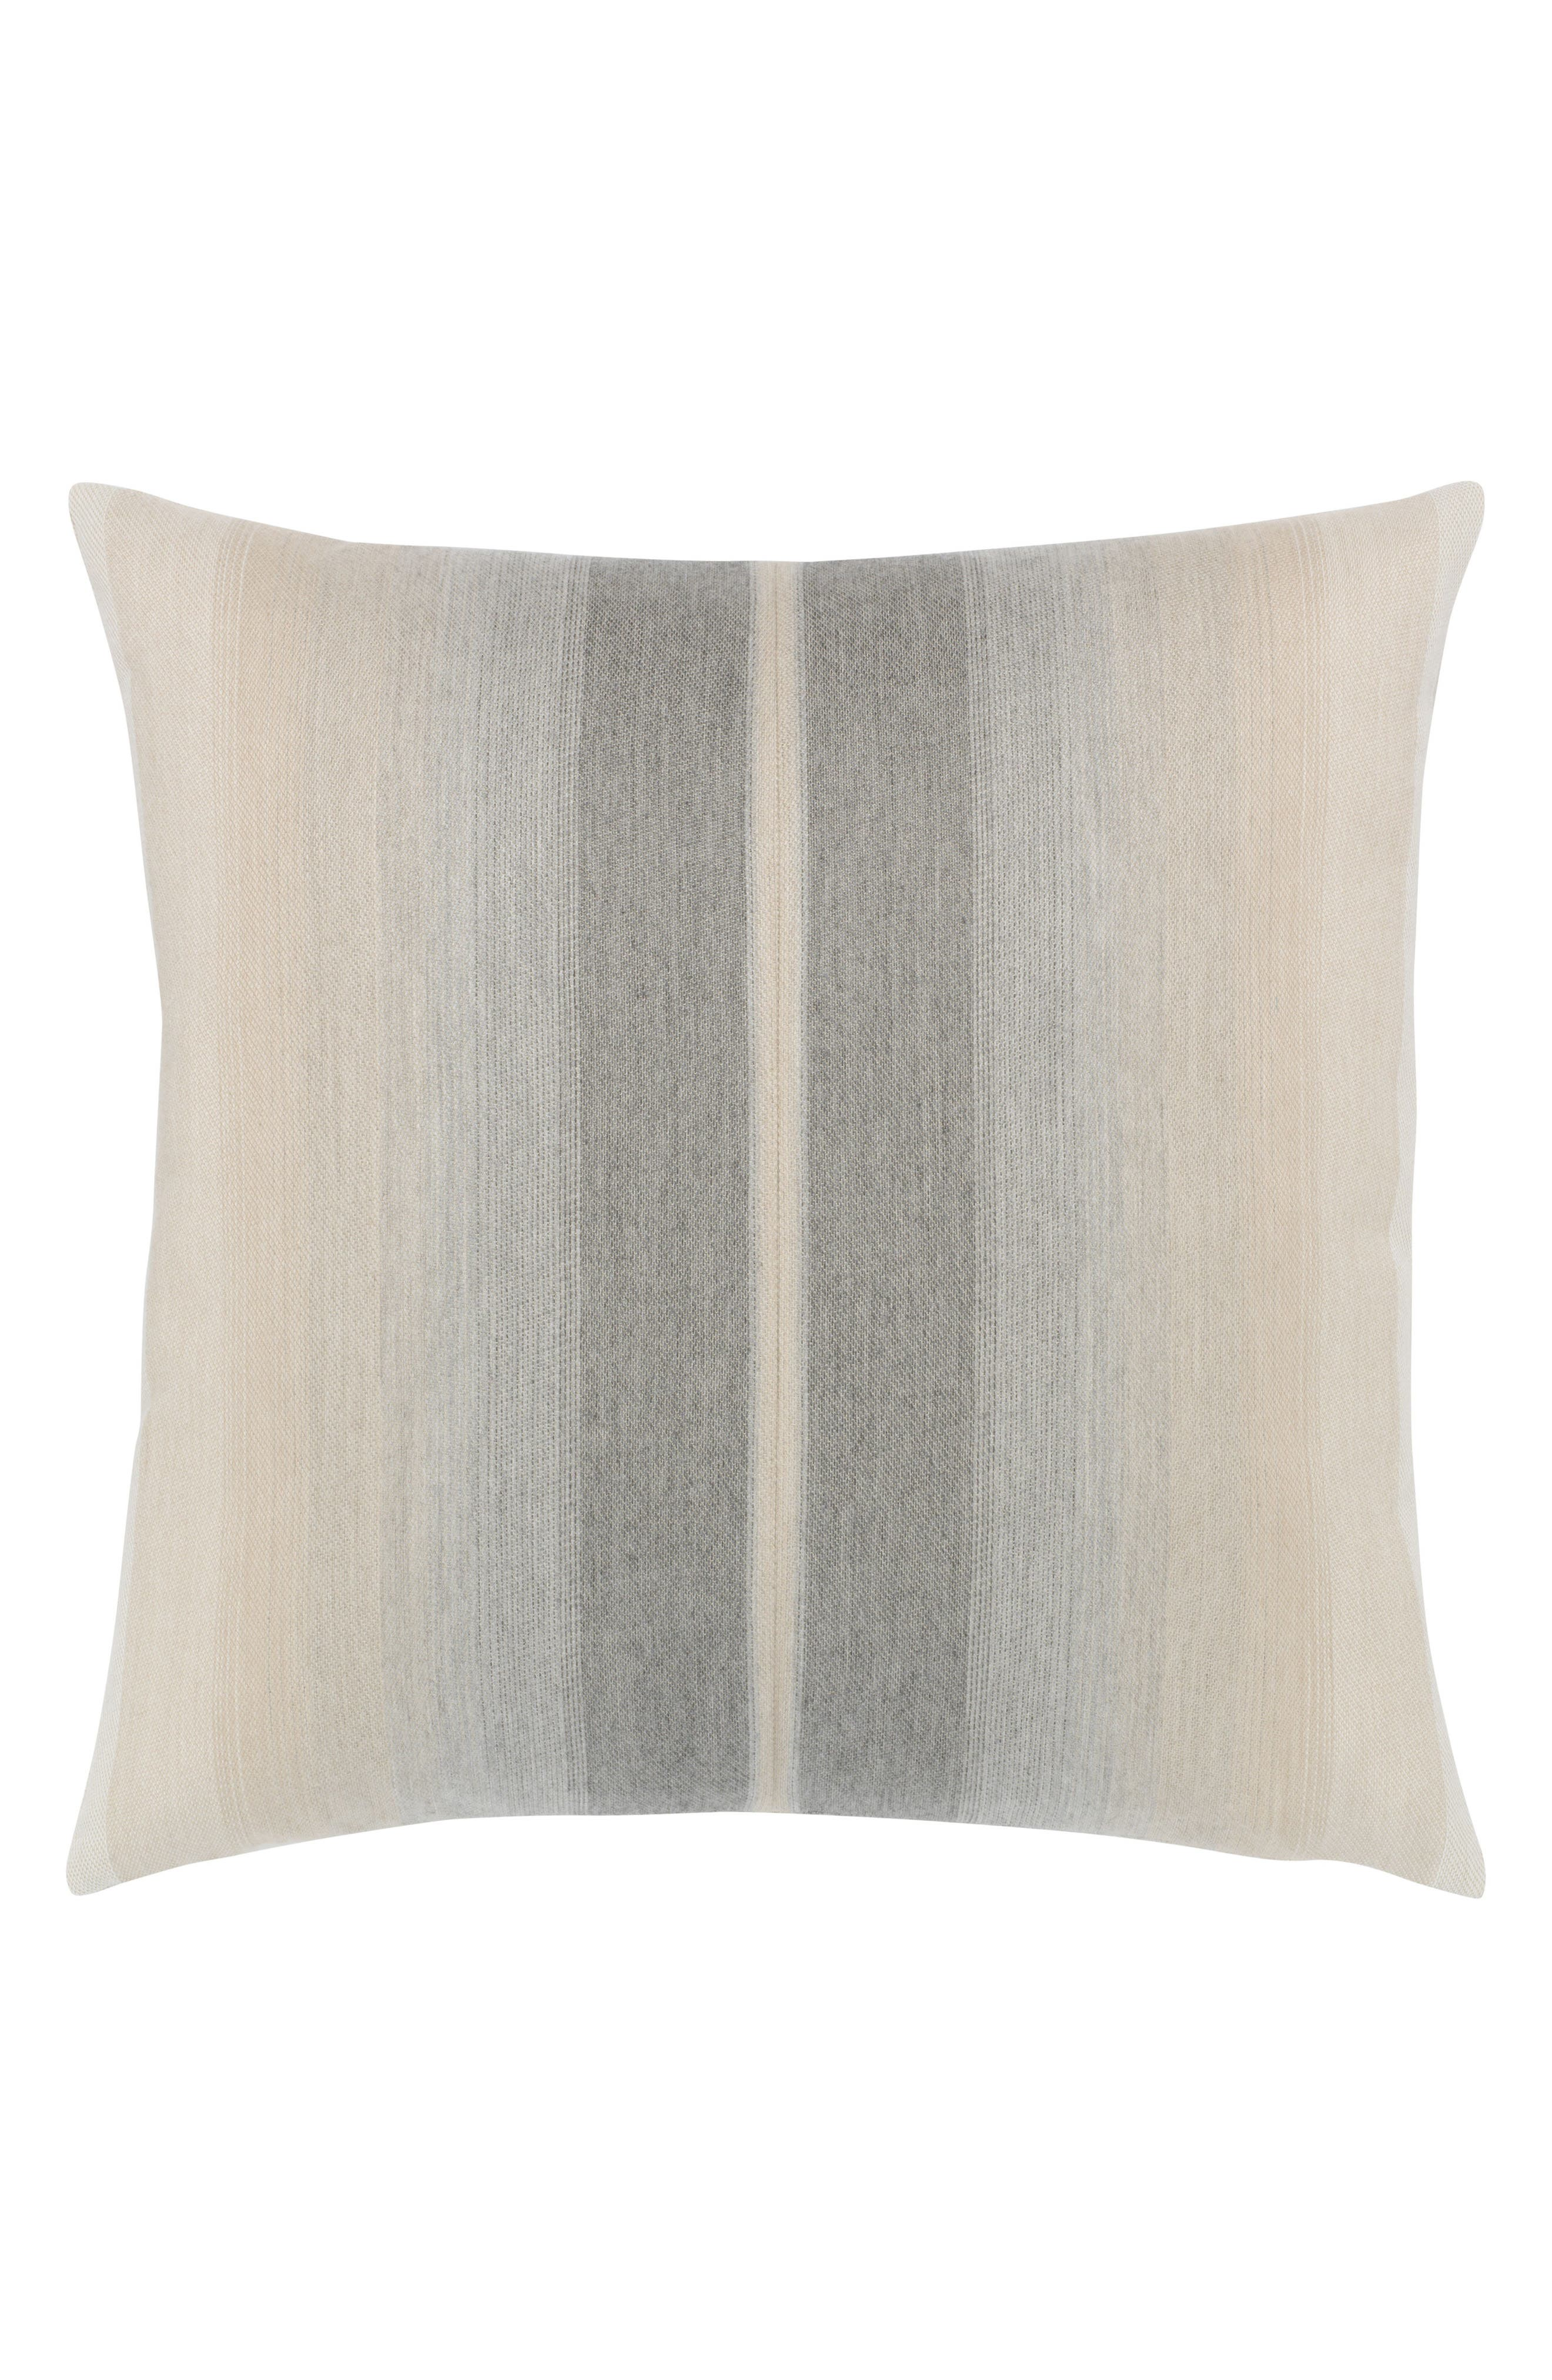 Ombré Grigio Indoor/Outdoor Accent Pillow,                             Main thumbnail 1, color,                             Grey